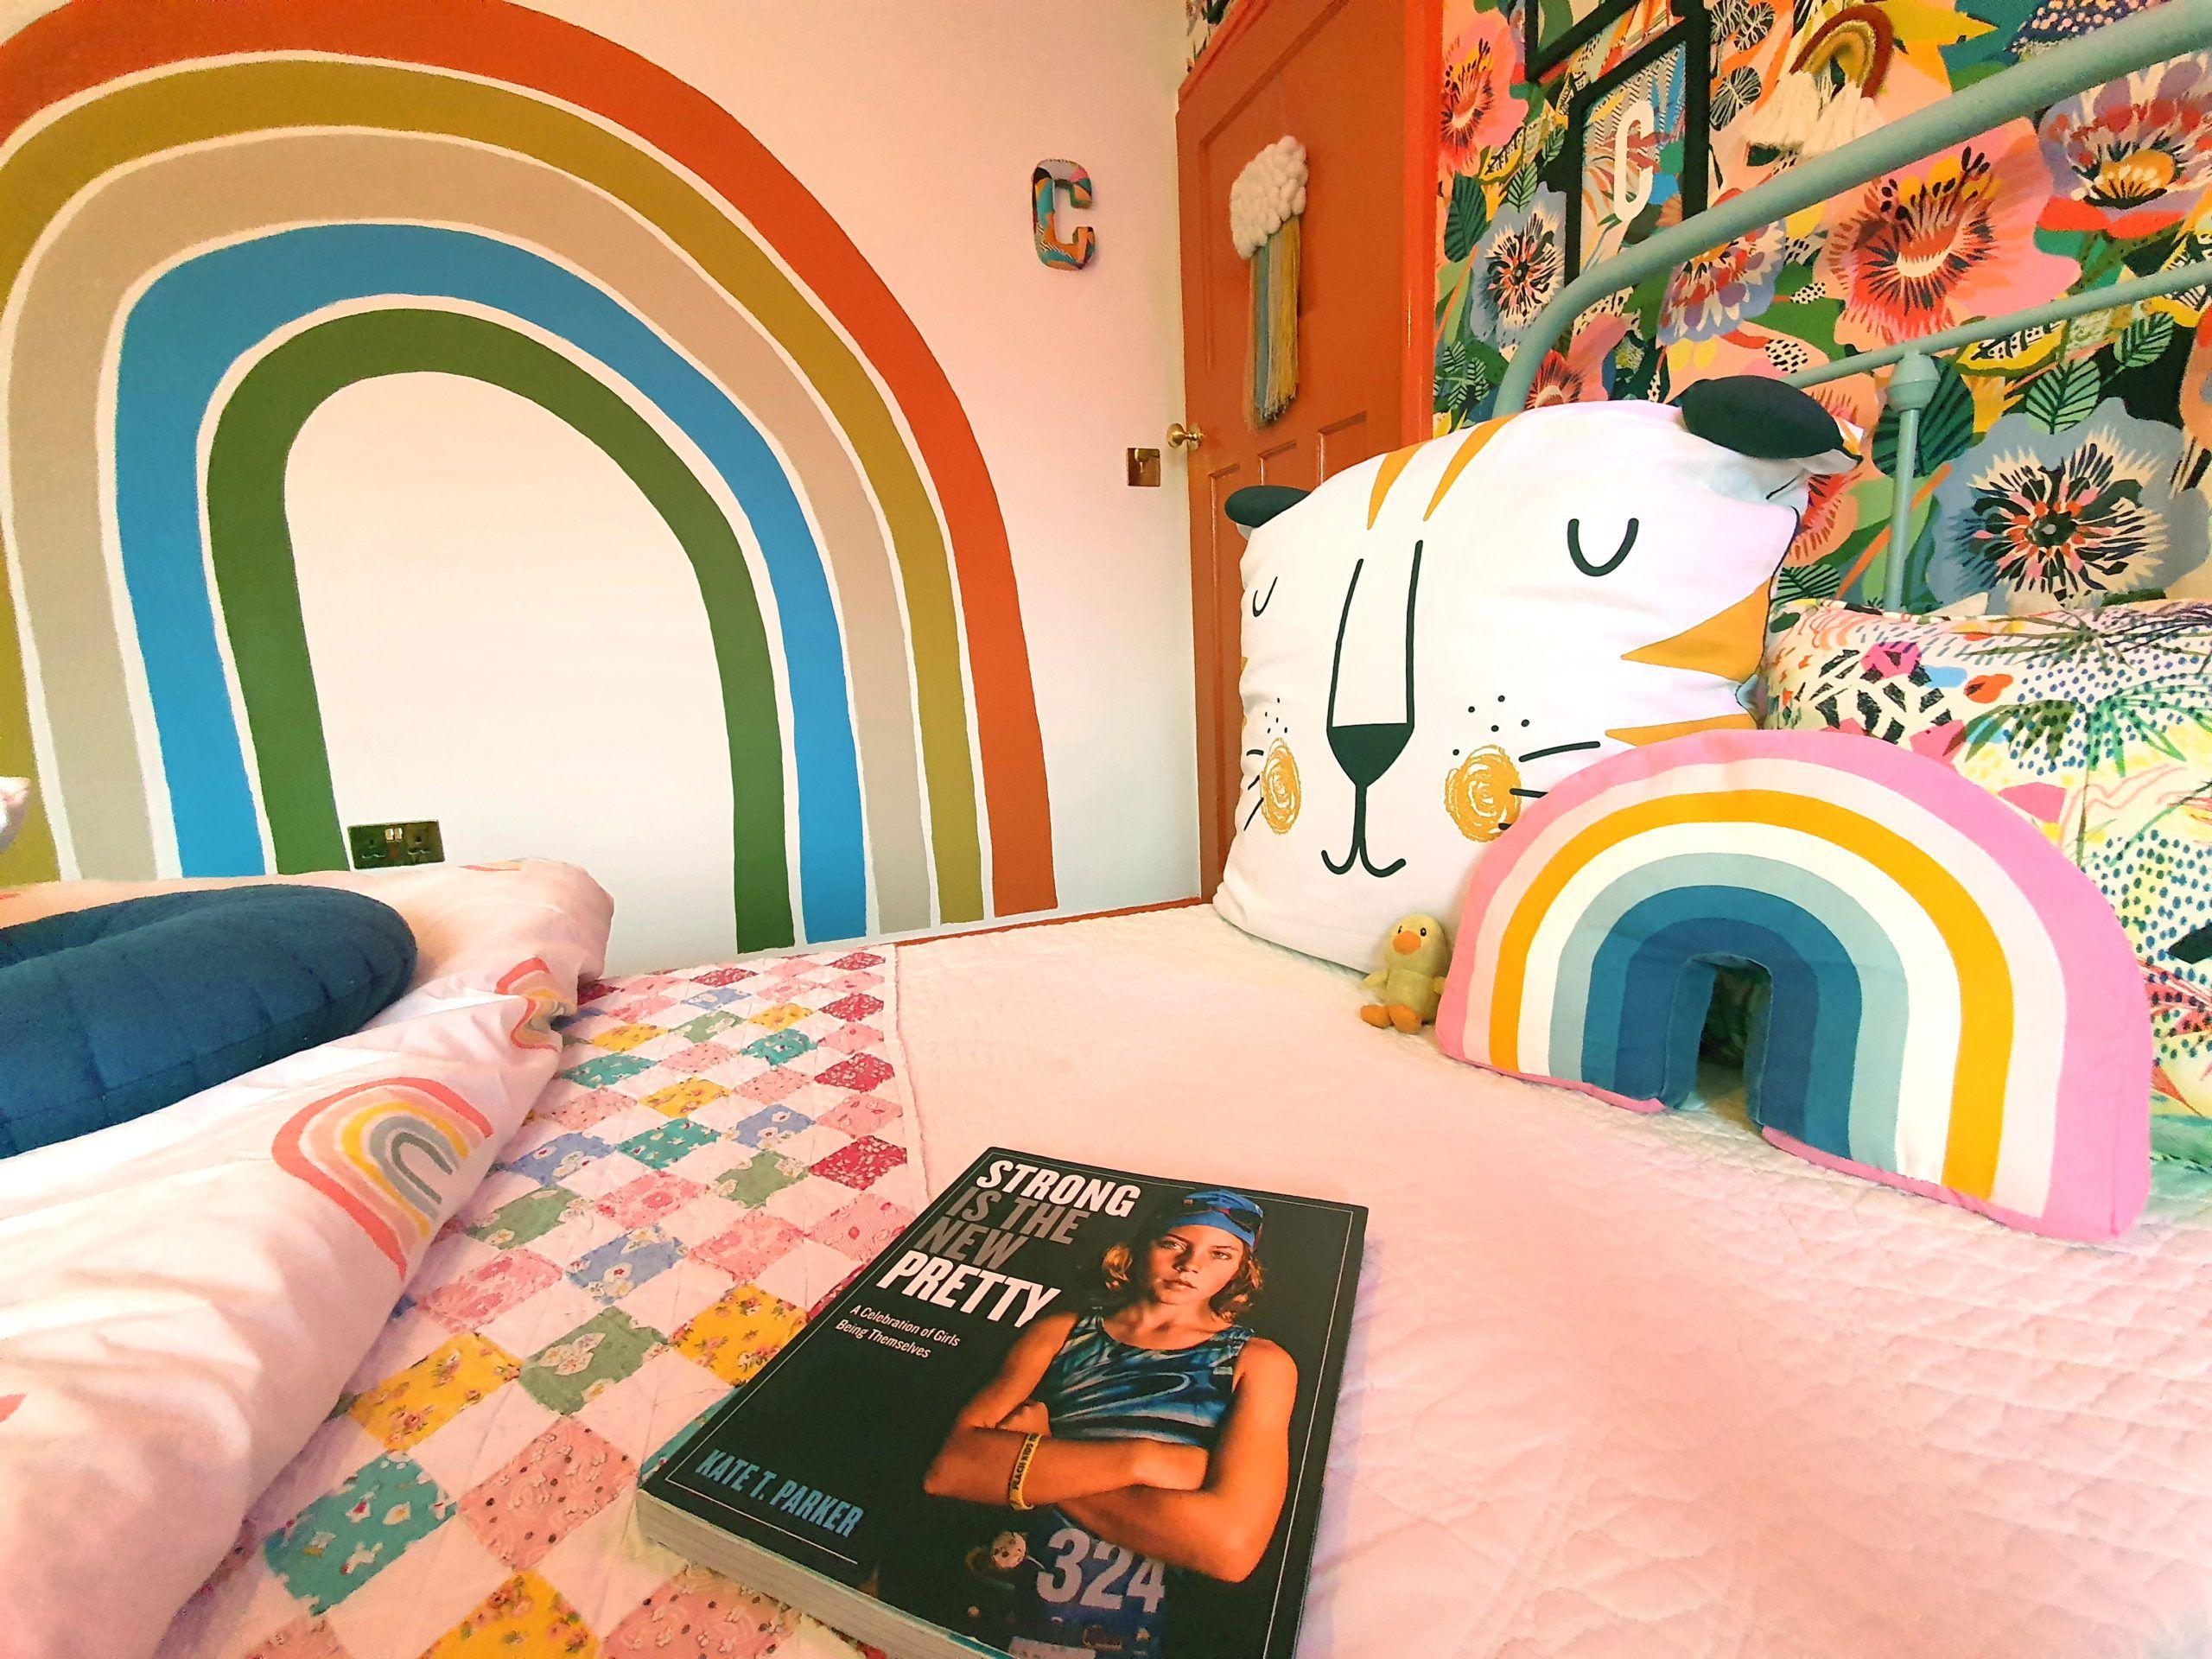 hand-painted rainbow on wall